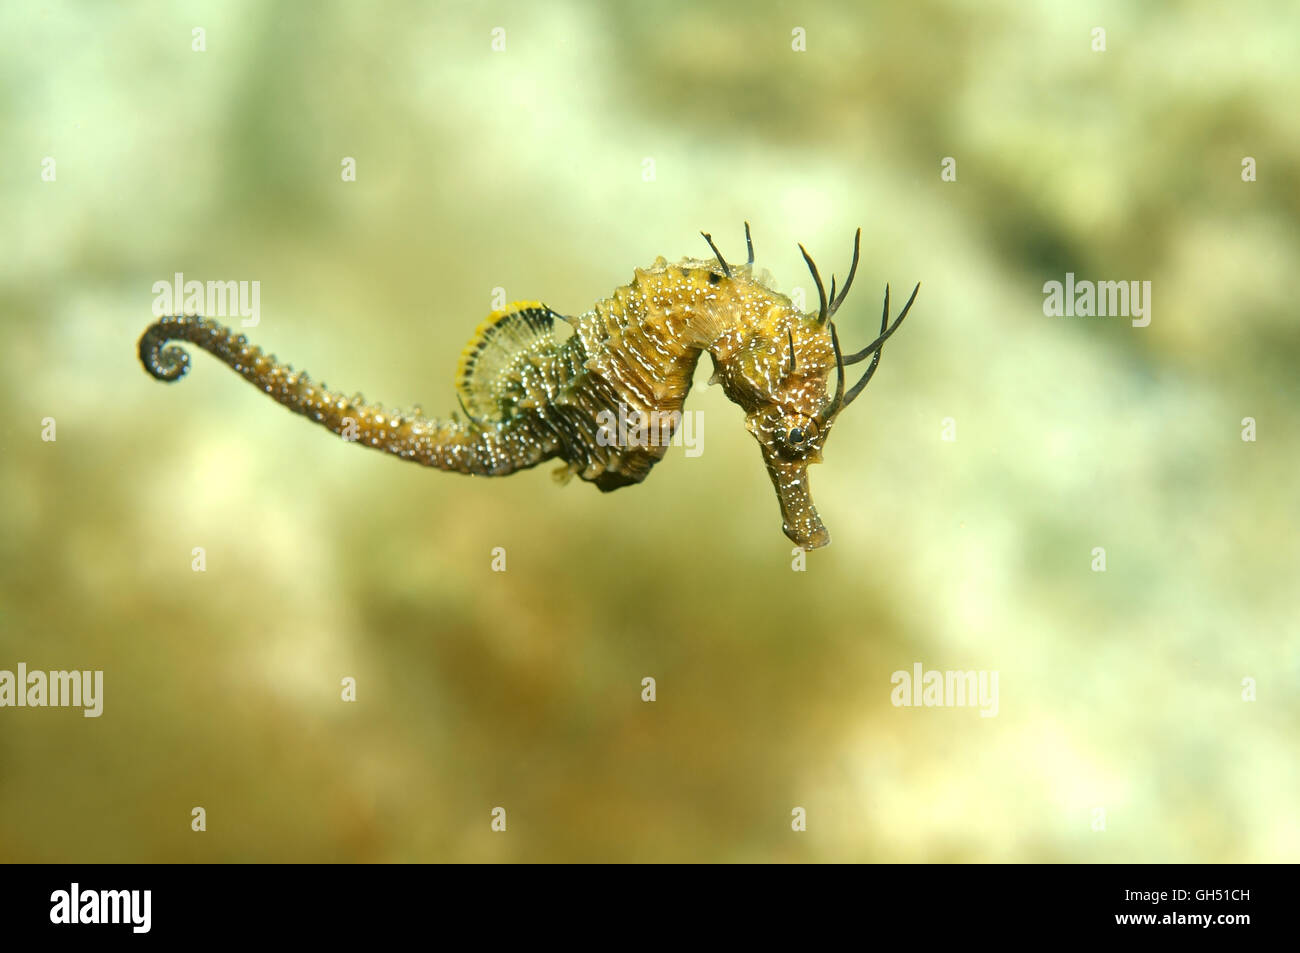 Maned Seahorse or Long-snouted seahorse (Hippocampus guttulatus) Black Sea Stock Photo